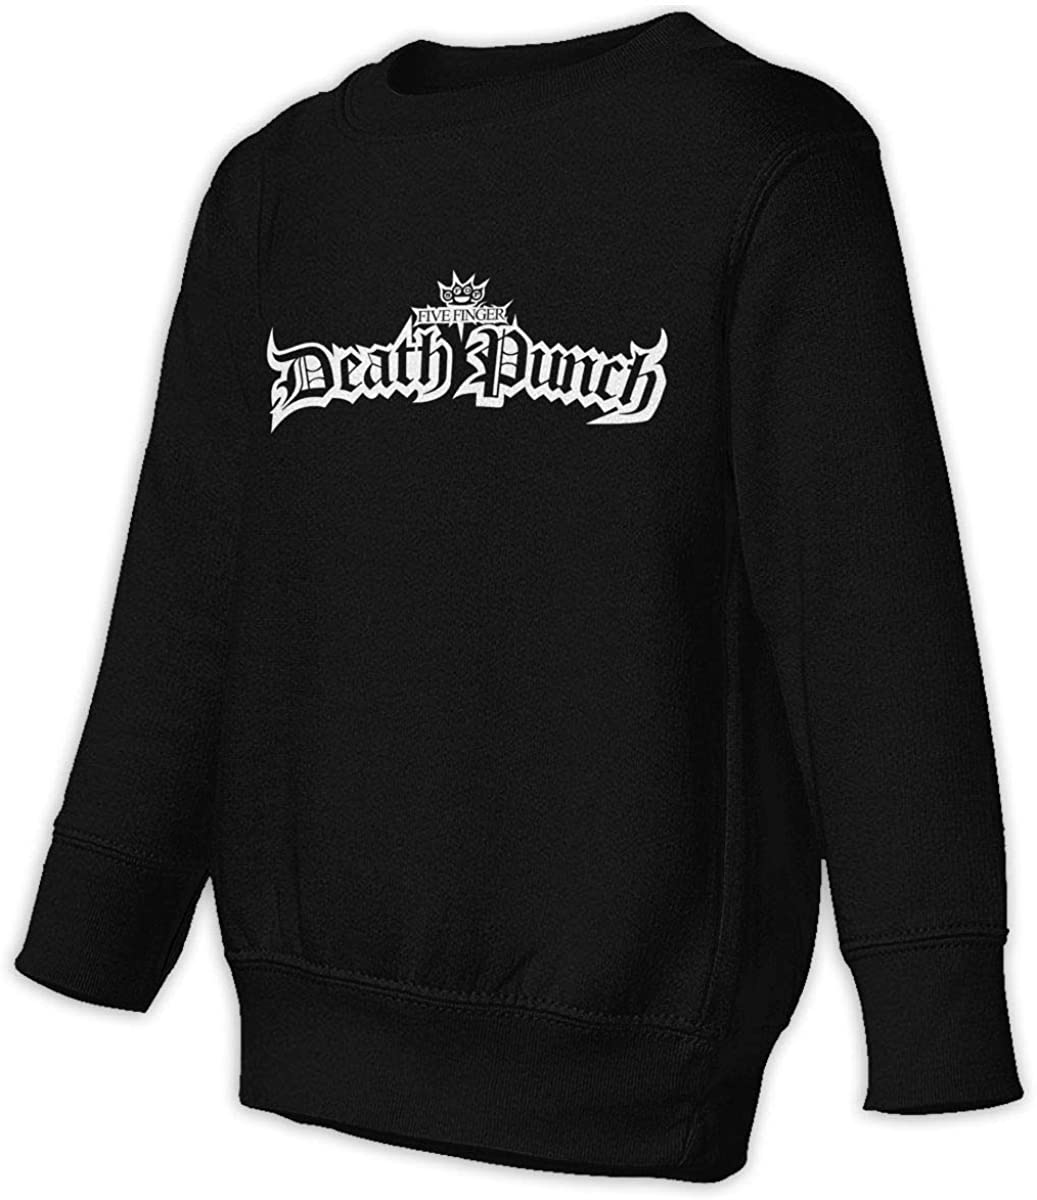 NOT Five Finger Death Punch Unisex Sweatshirt Youth Boy and Girls Pullover Sweatshirt